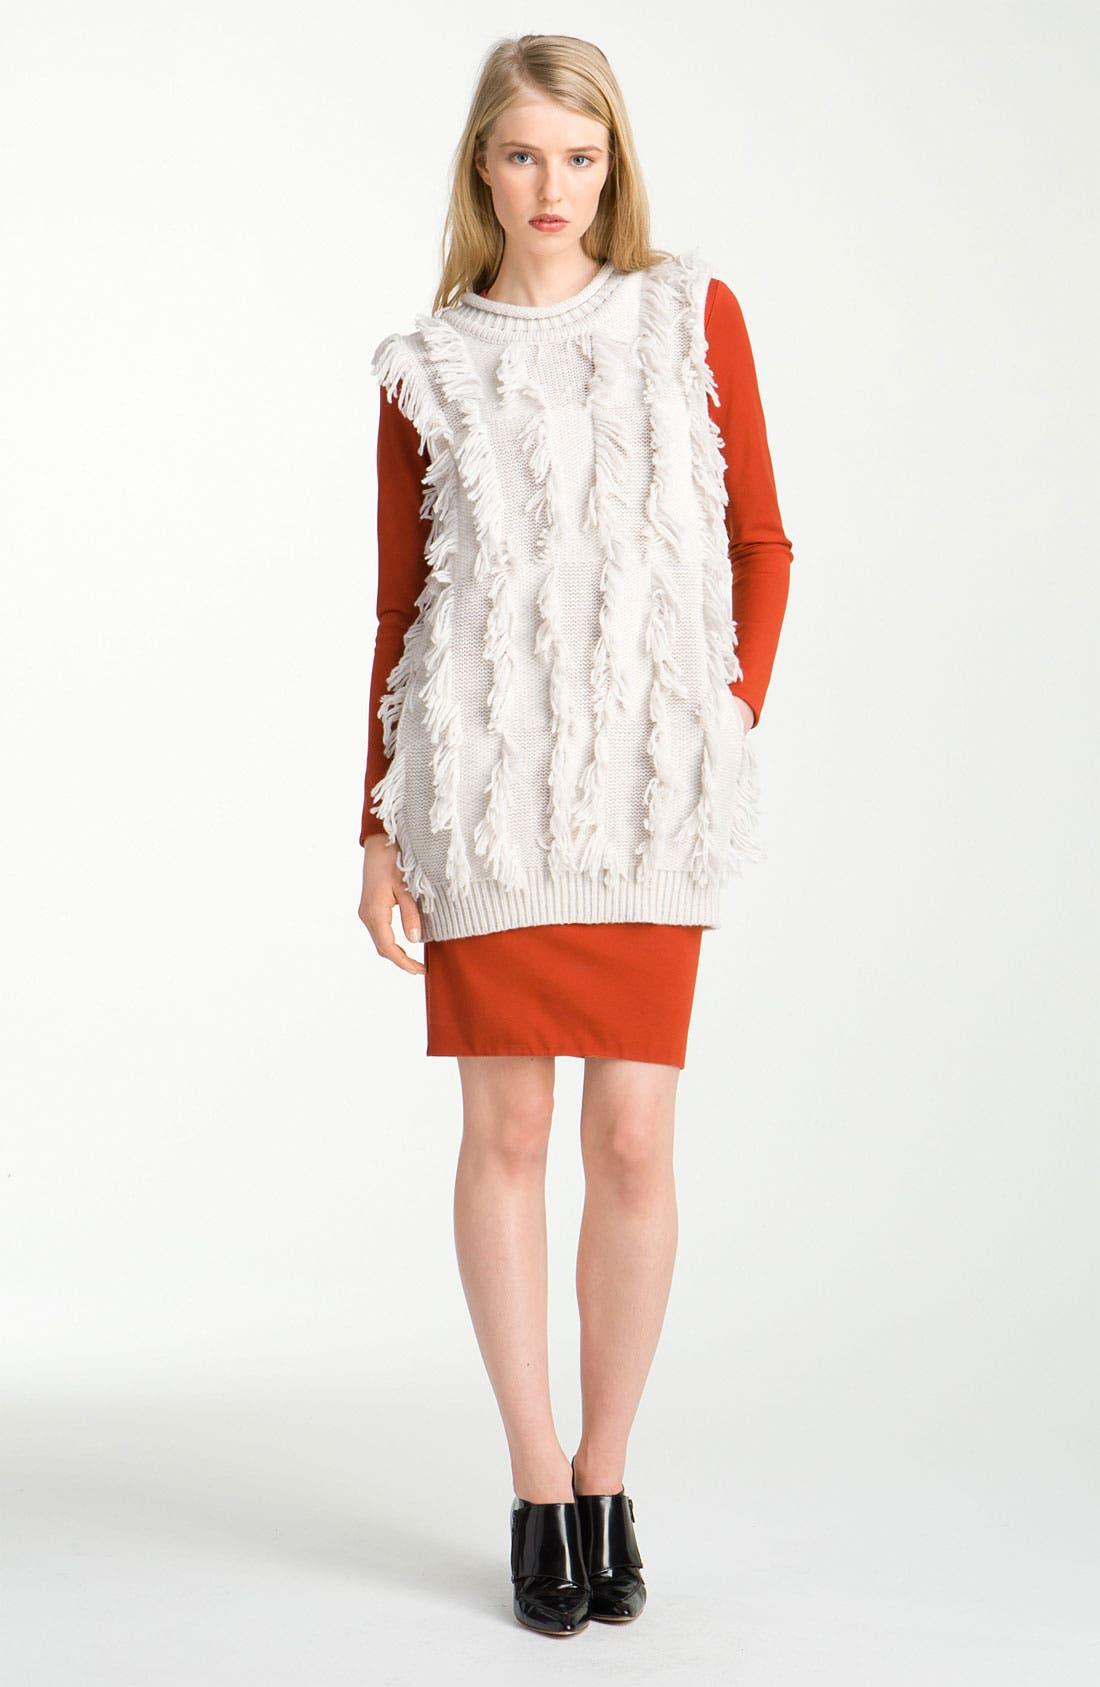 Alternate Image 1 Selected - 3.1 Phillip Lim Fringe Intarsia Tunic Sweater